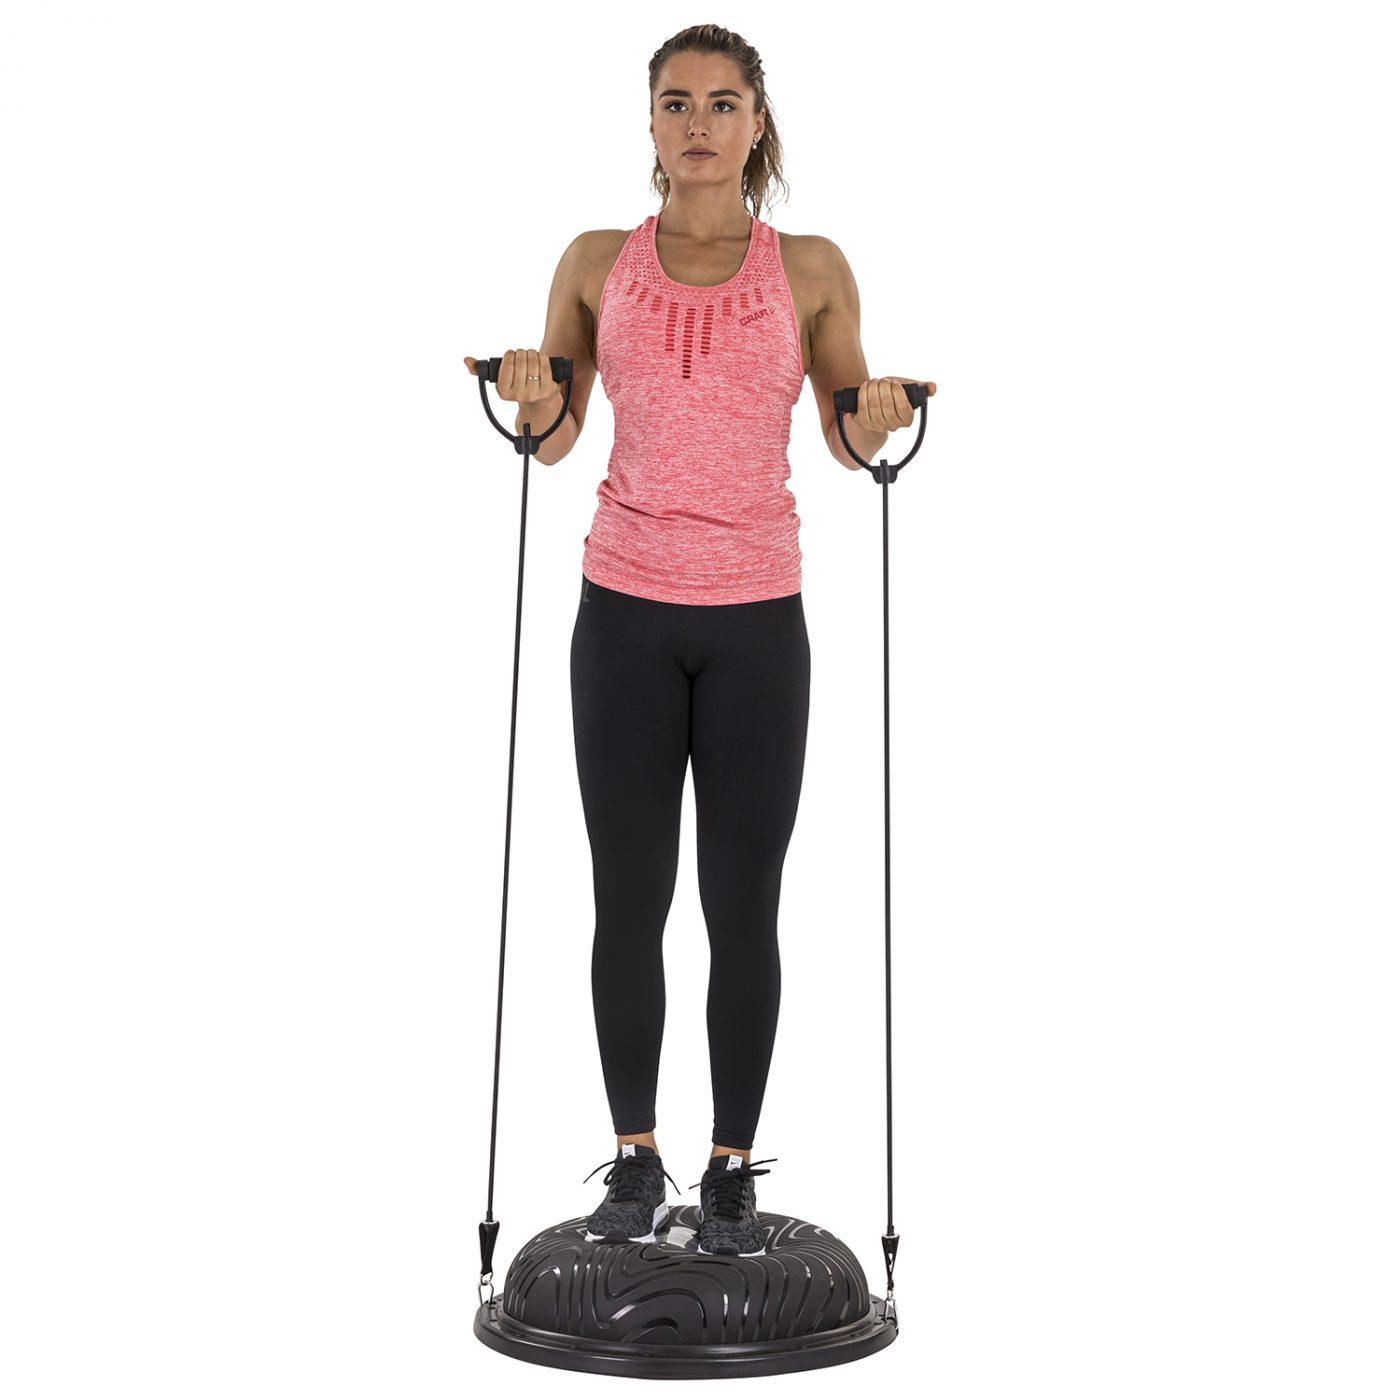 Tunturi Balanstrainer - Balance trainer - Pro